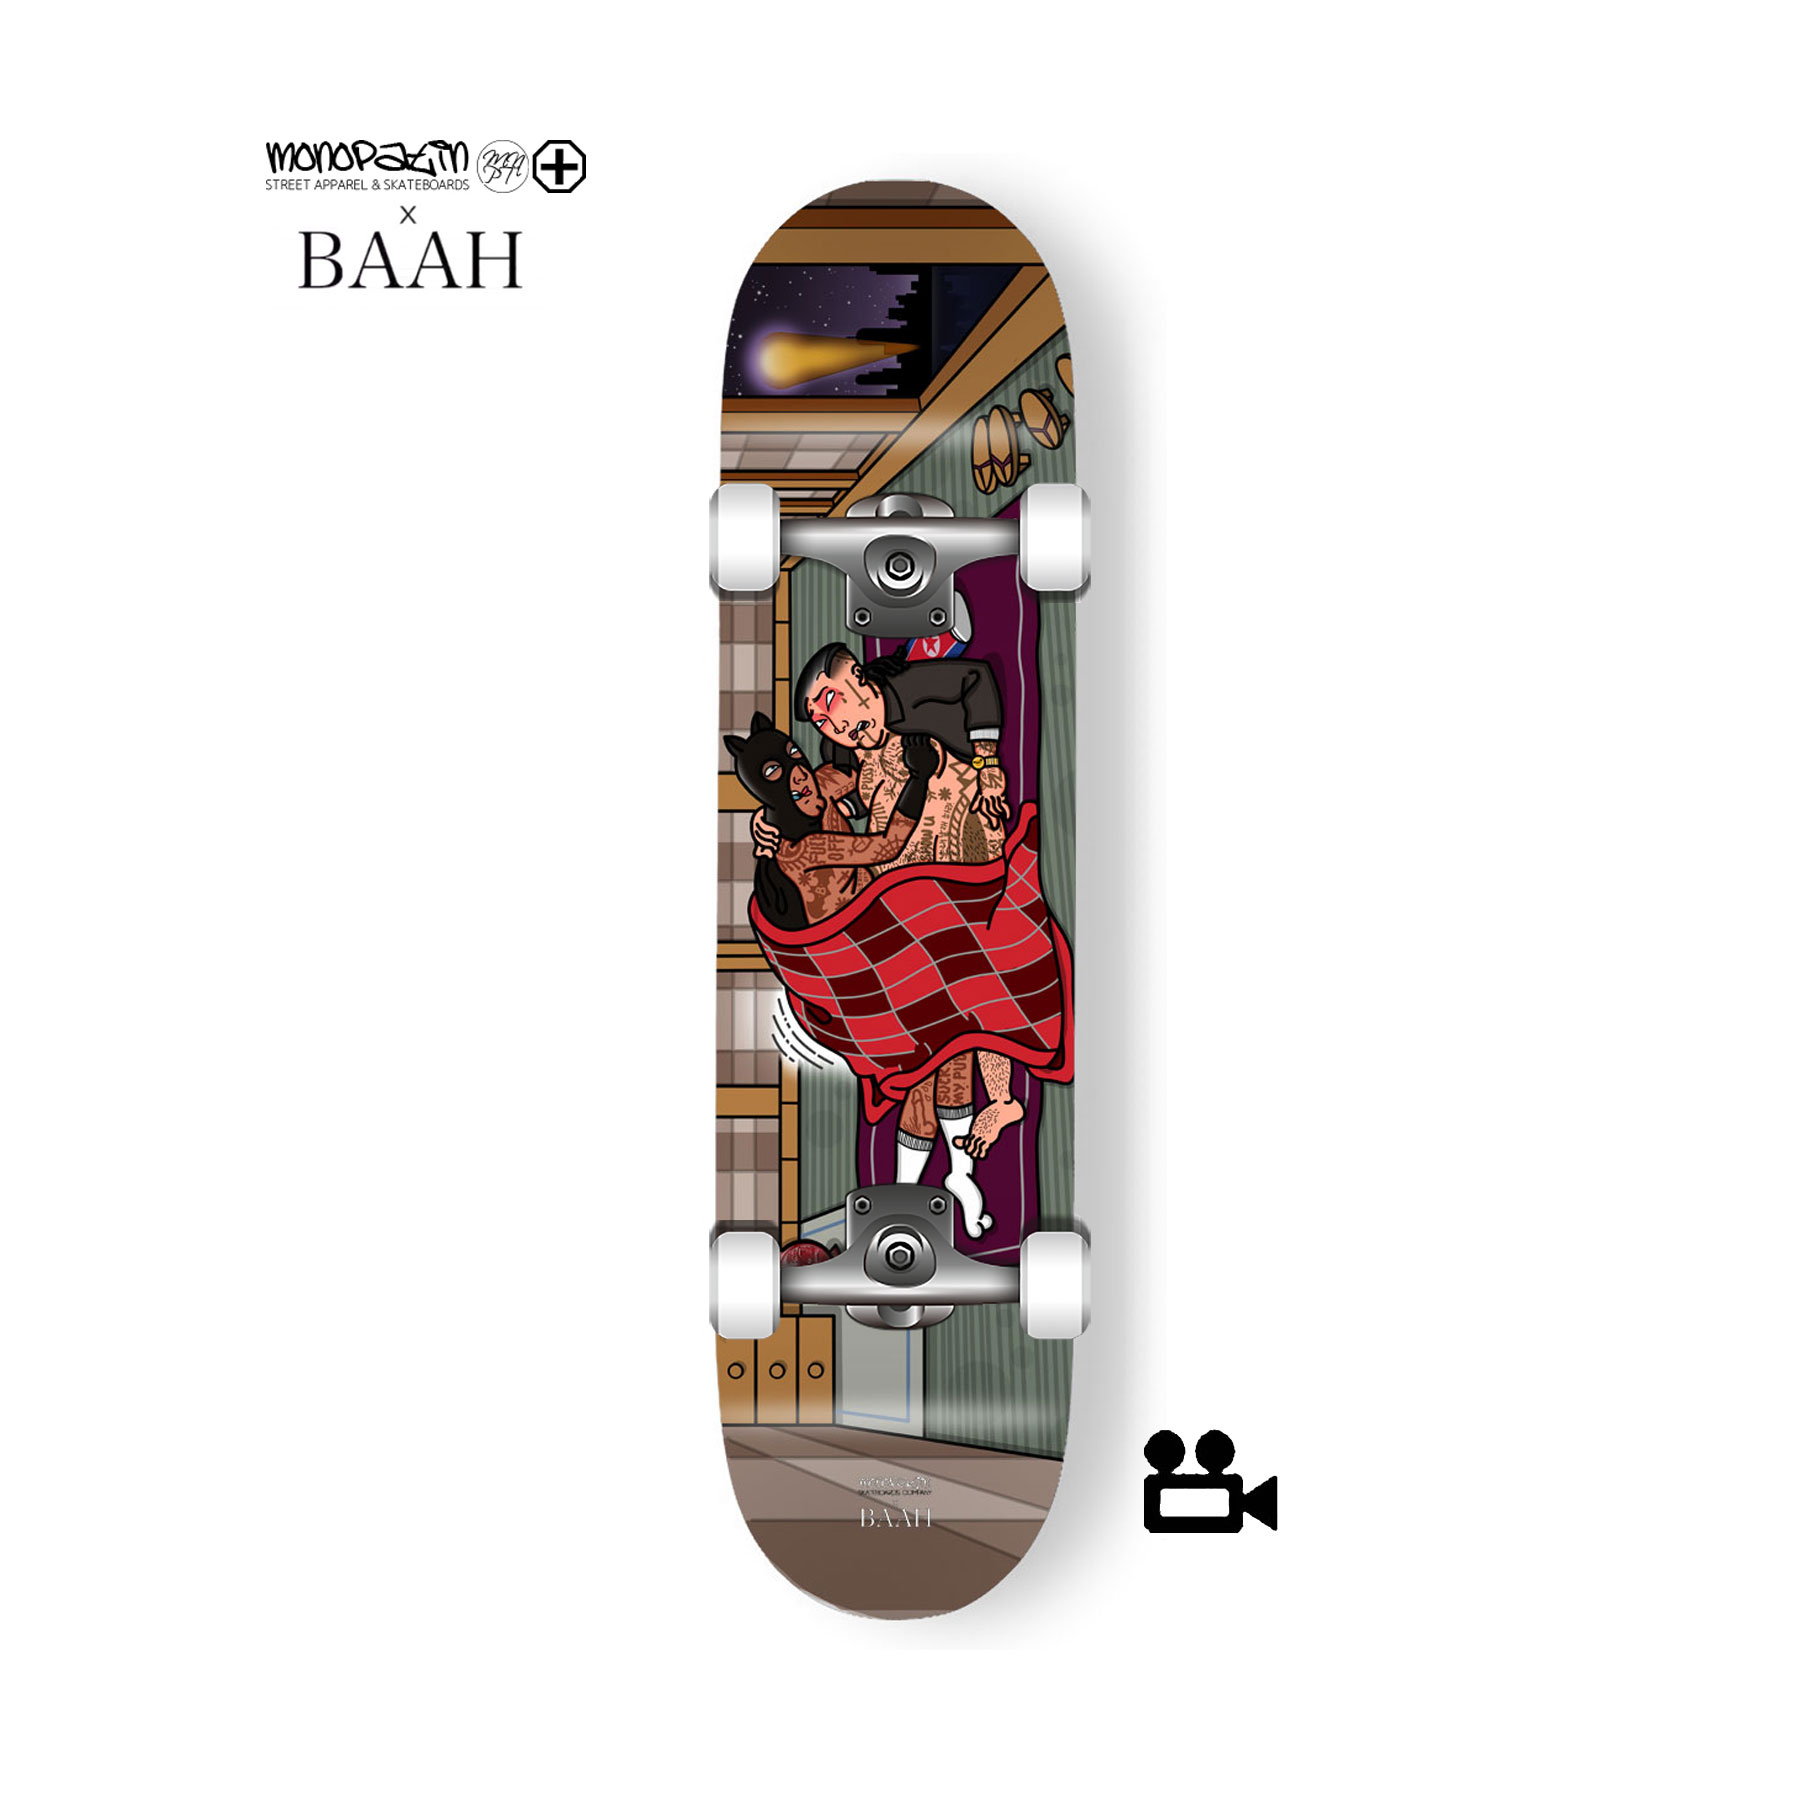 monopatin x BAAH collaboration 컴플릿 스케이트보드